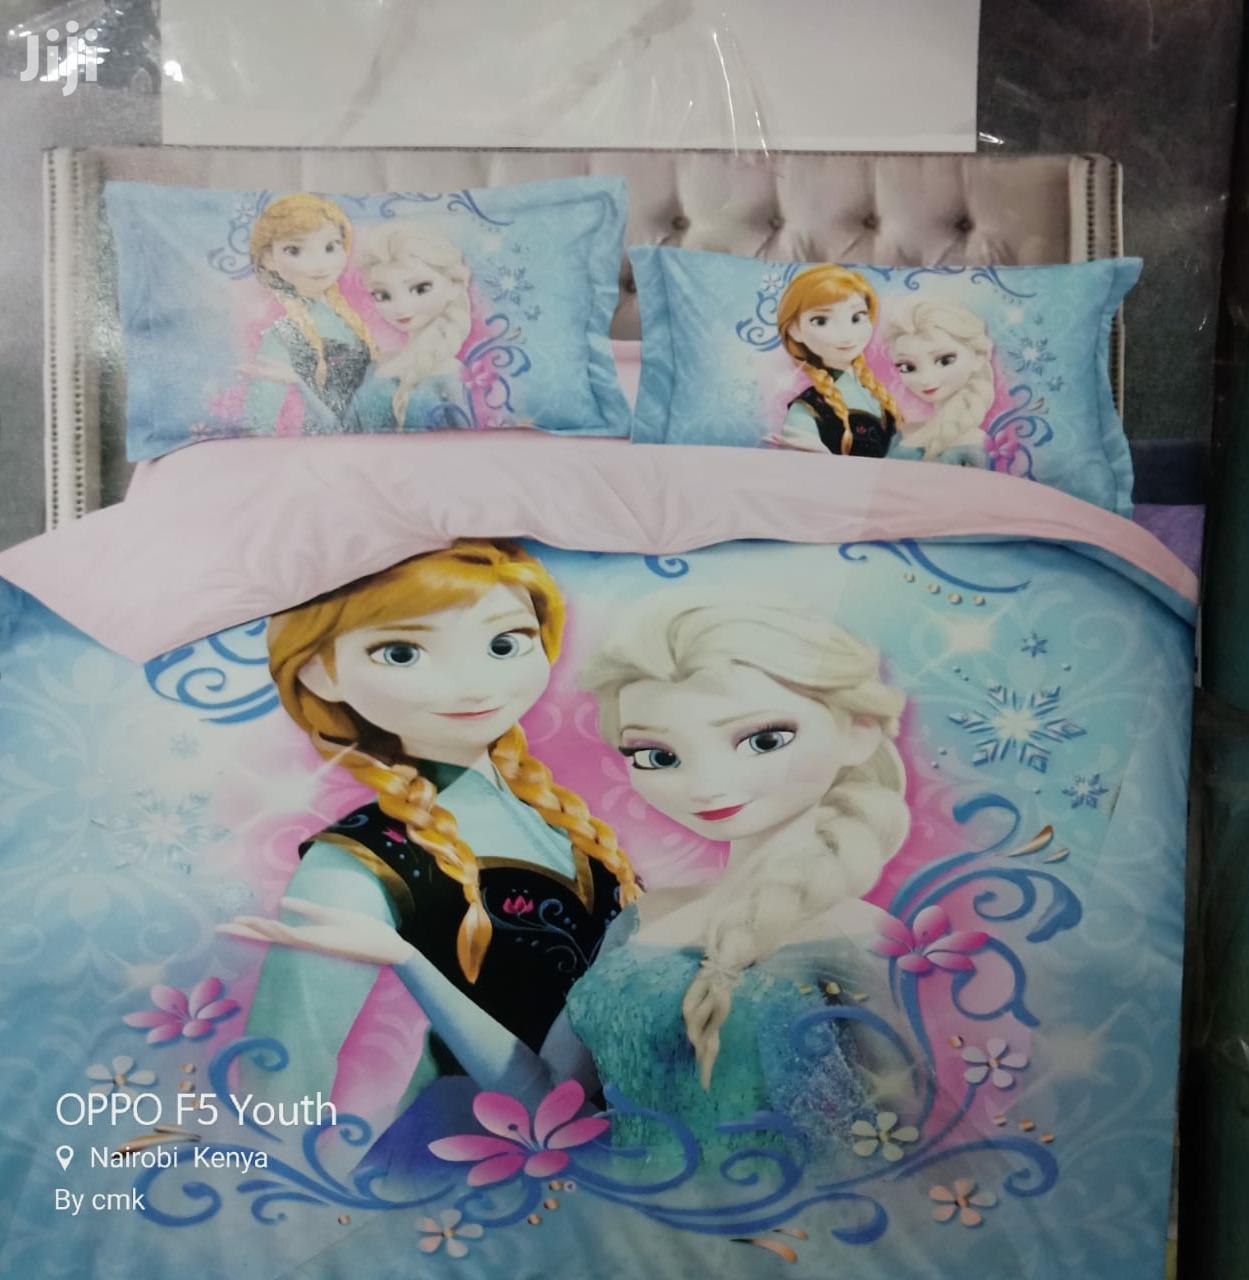 Cartoon Kids Duvets With A Matching Bed Sheet And A Pillow Case